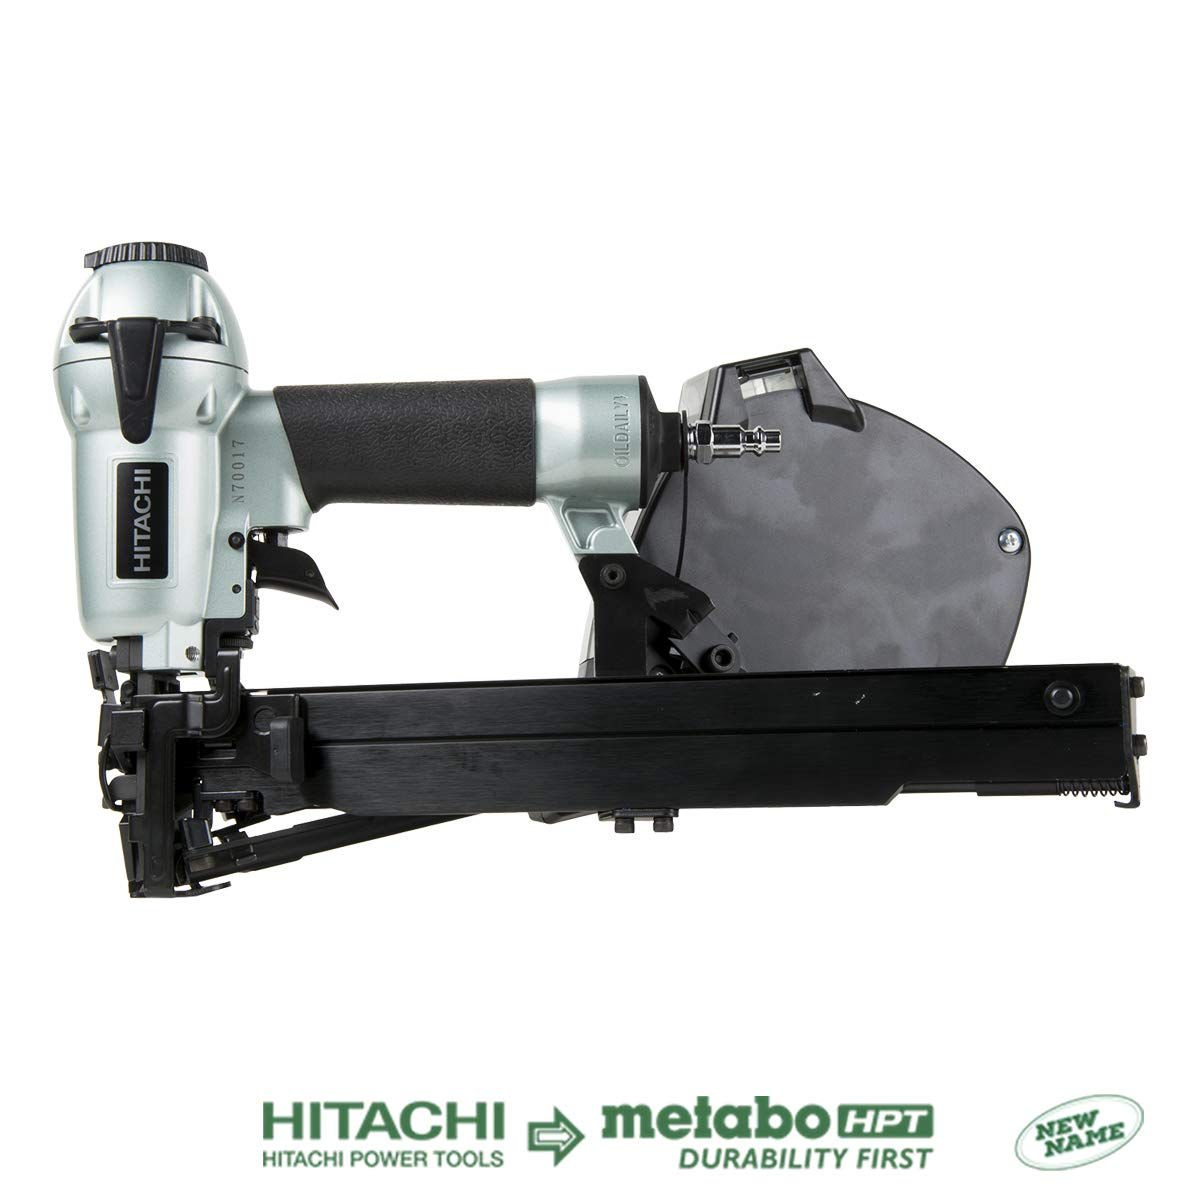 Hitachi N3808AP 18 Gauge 1-1/2'' Cap Stapler by Hitachi